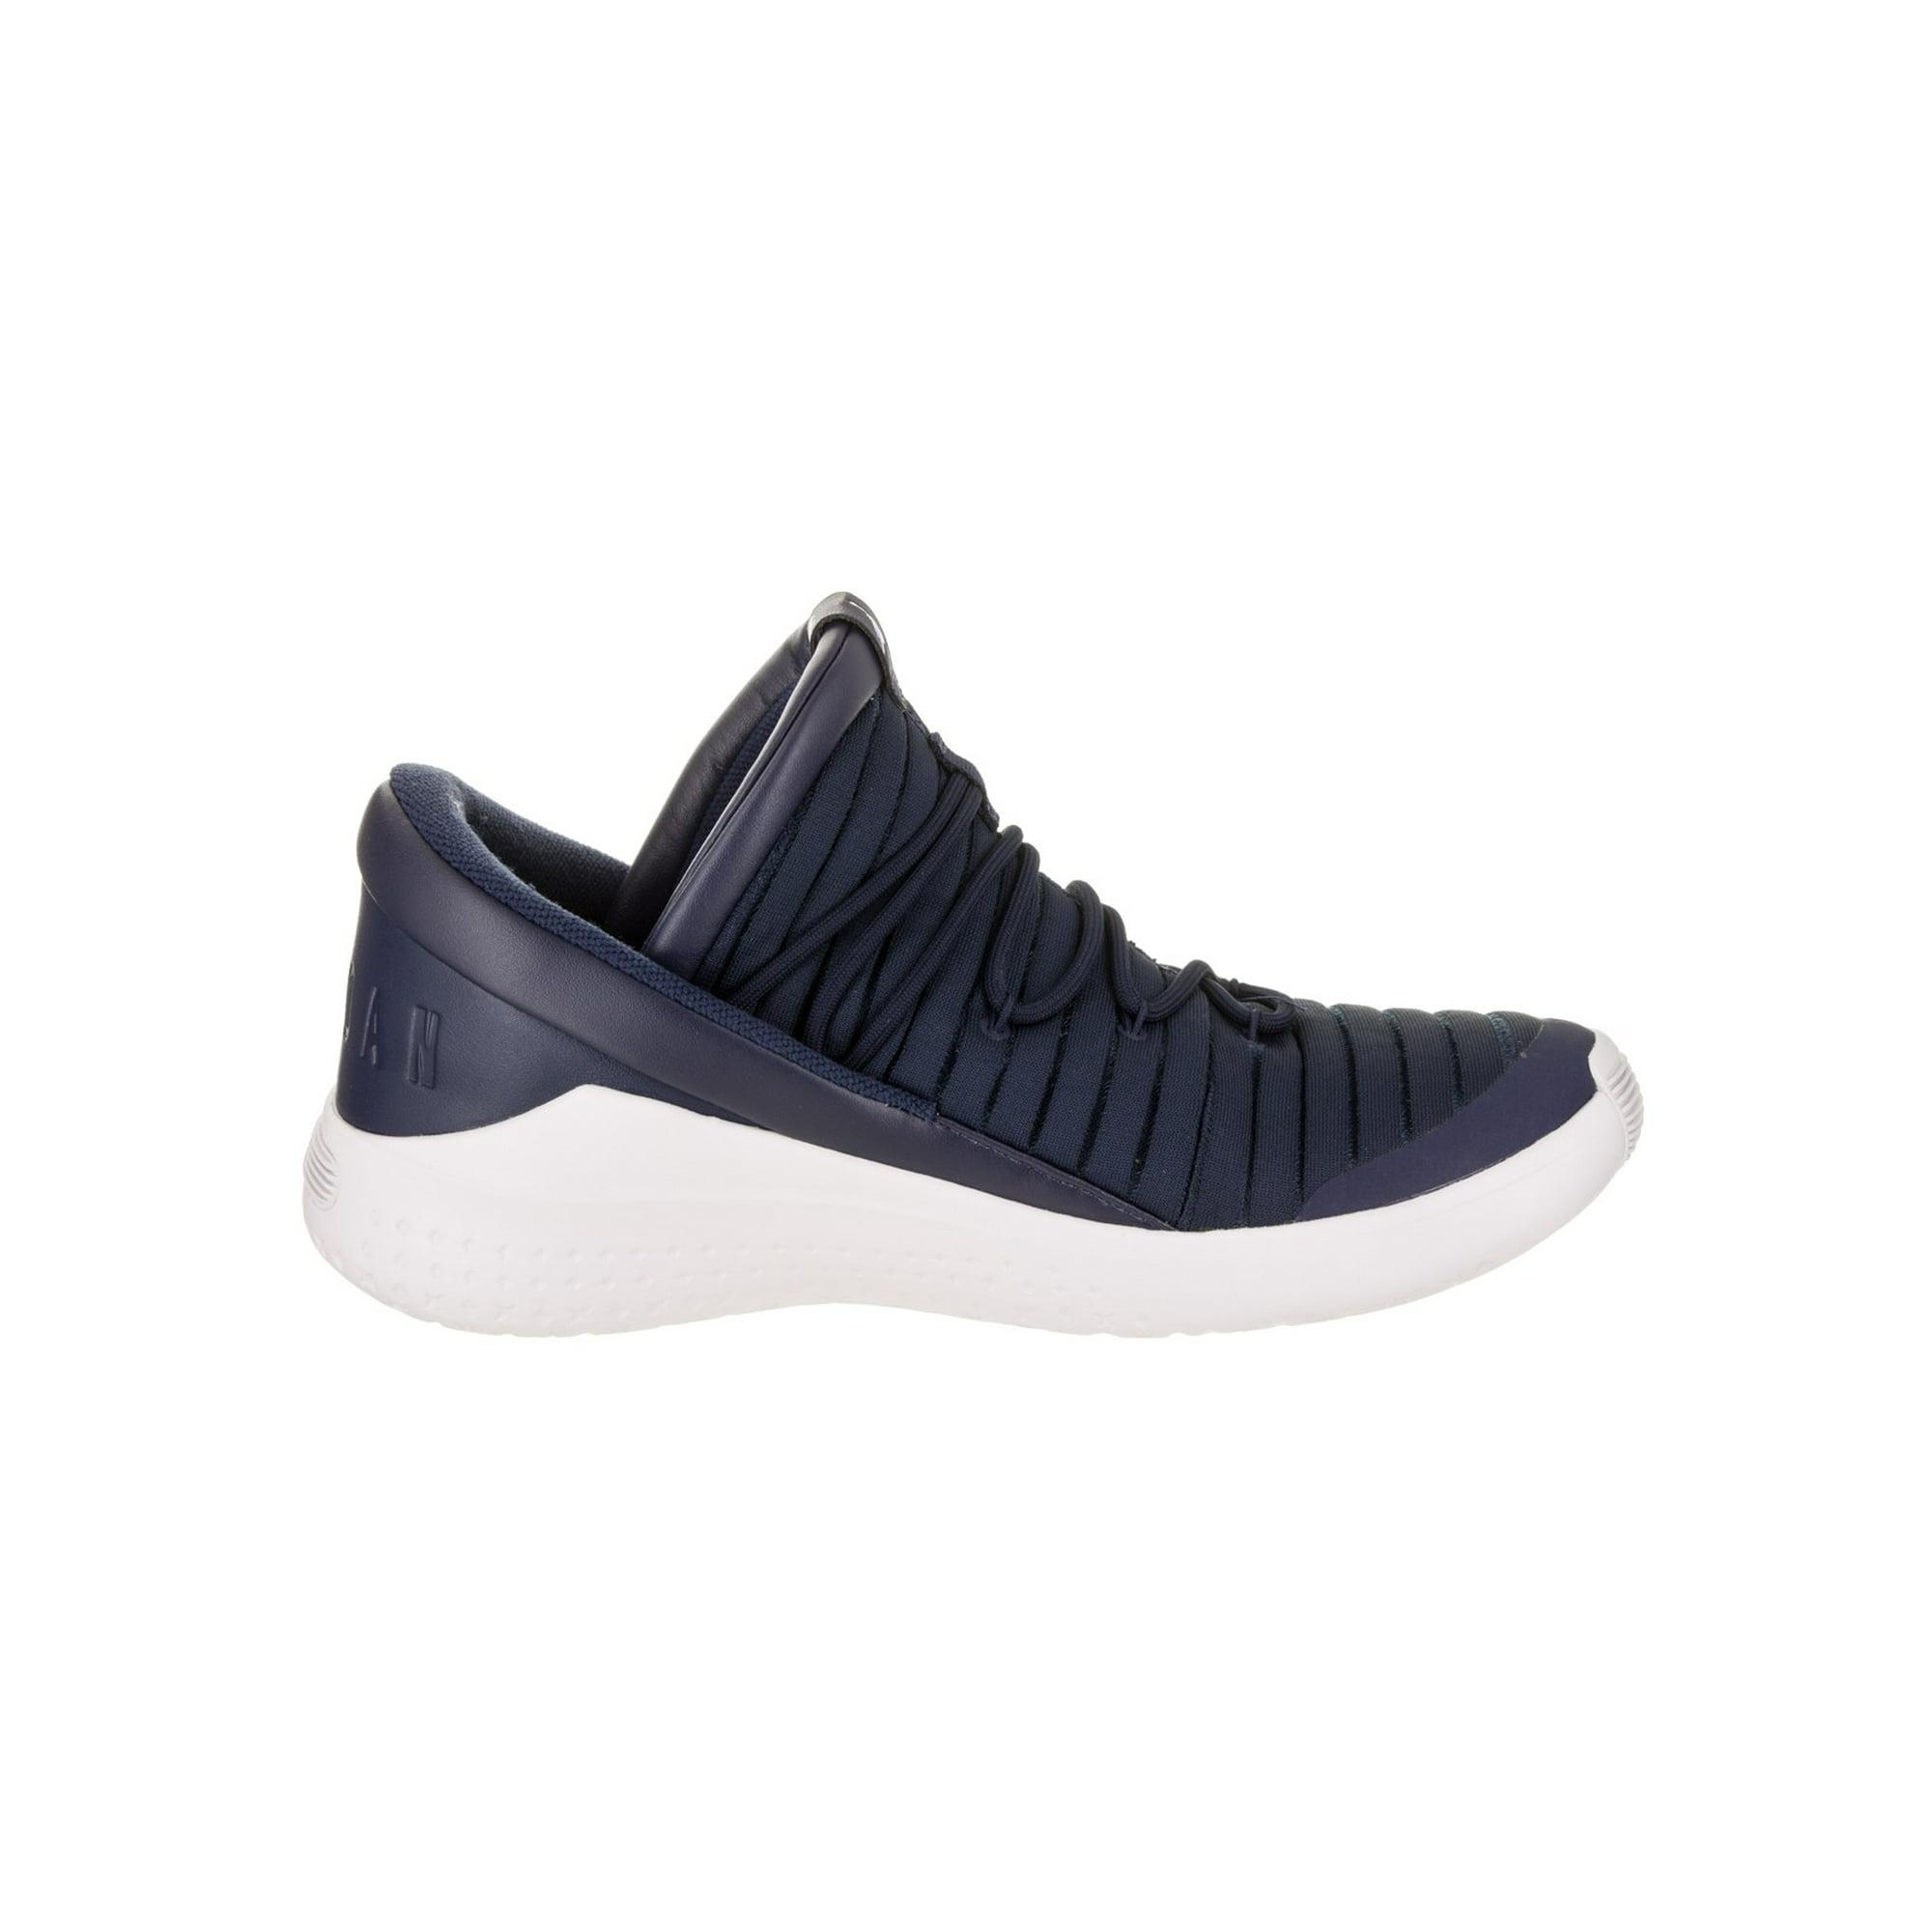 d4f68d0133daea Nike Jordan Men s Jordan Flight Luxe Training Shoe